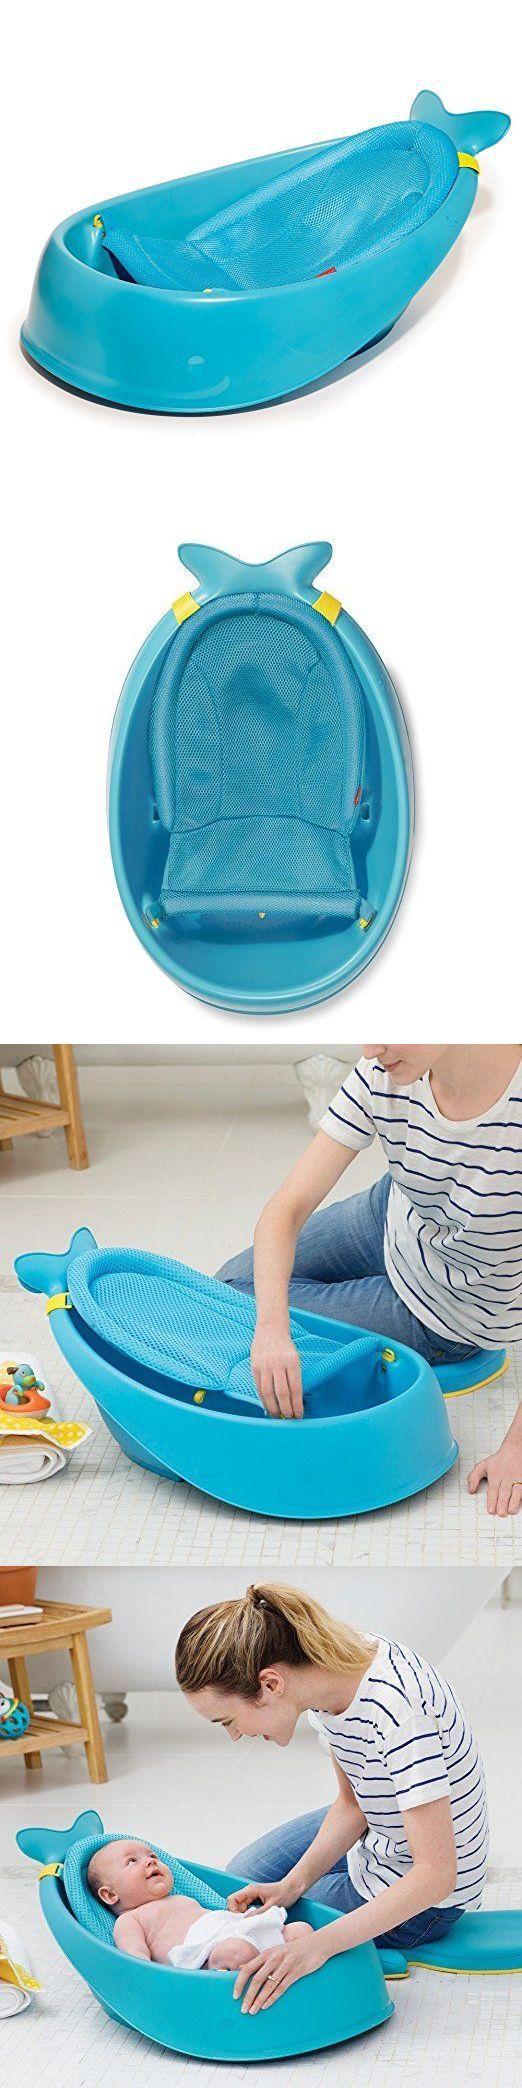 New Model Skip Hop Moby Bath Smart Sling 3 Stage Bathtub Blue